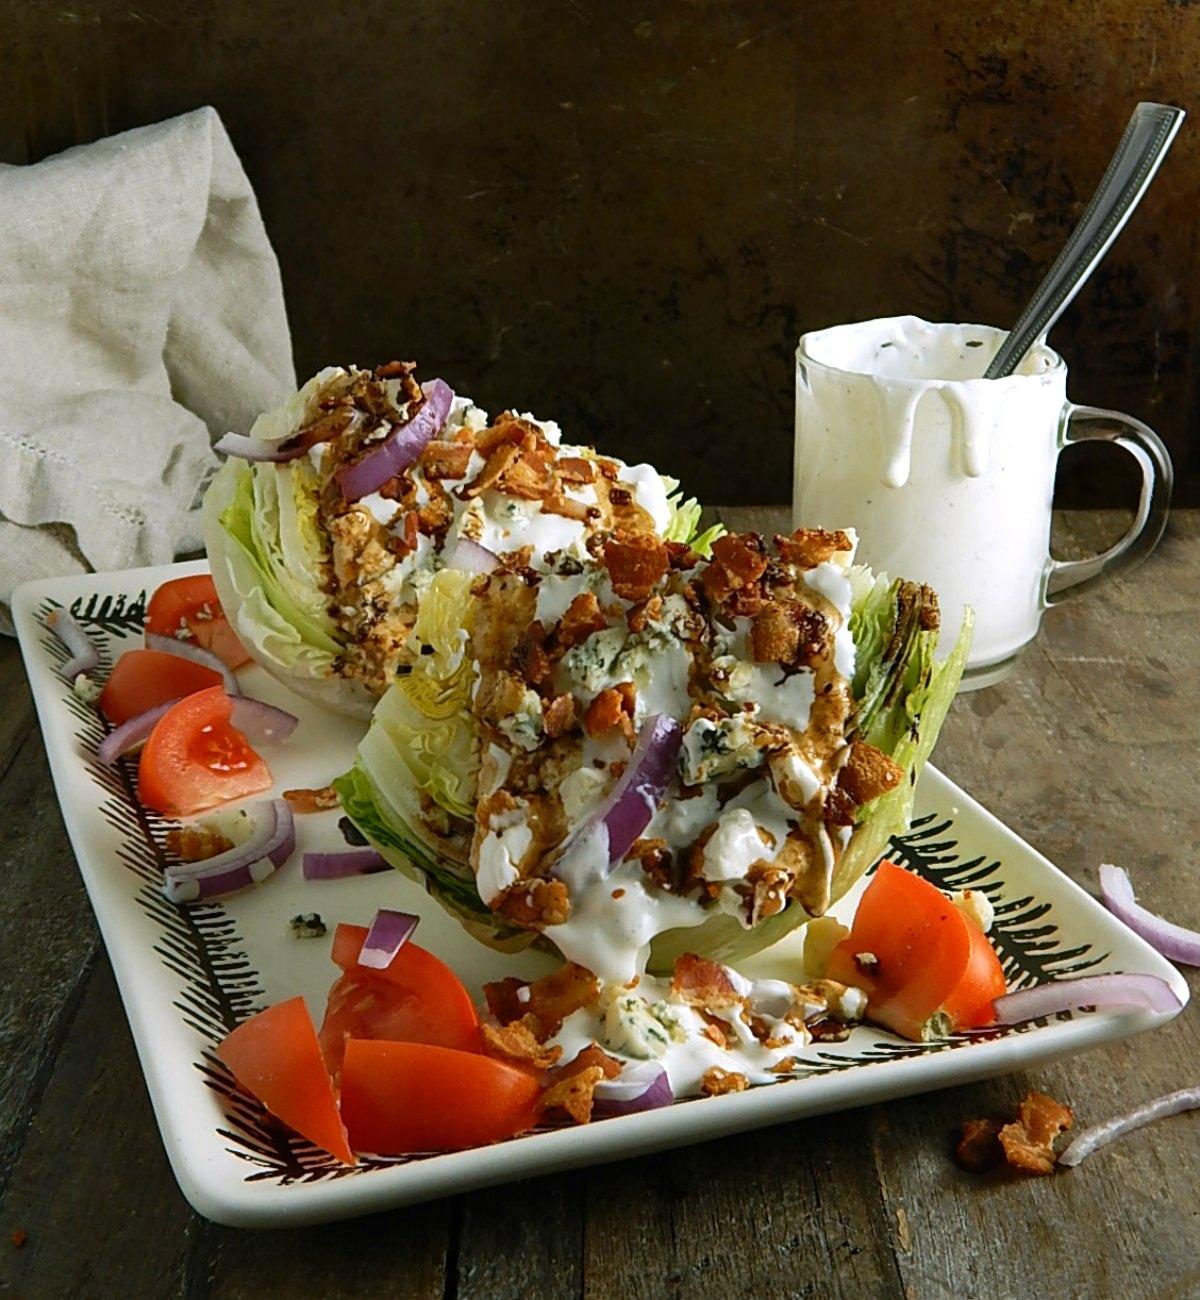 image regarding Outback Steakhouse Printable Menu called Copycat Outback Steakhouse Salad